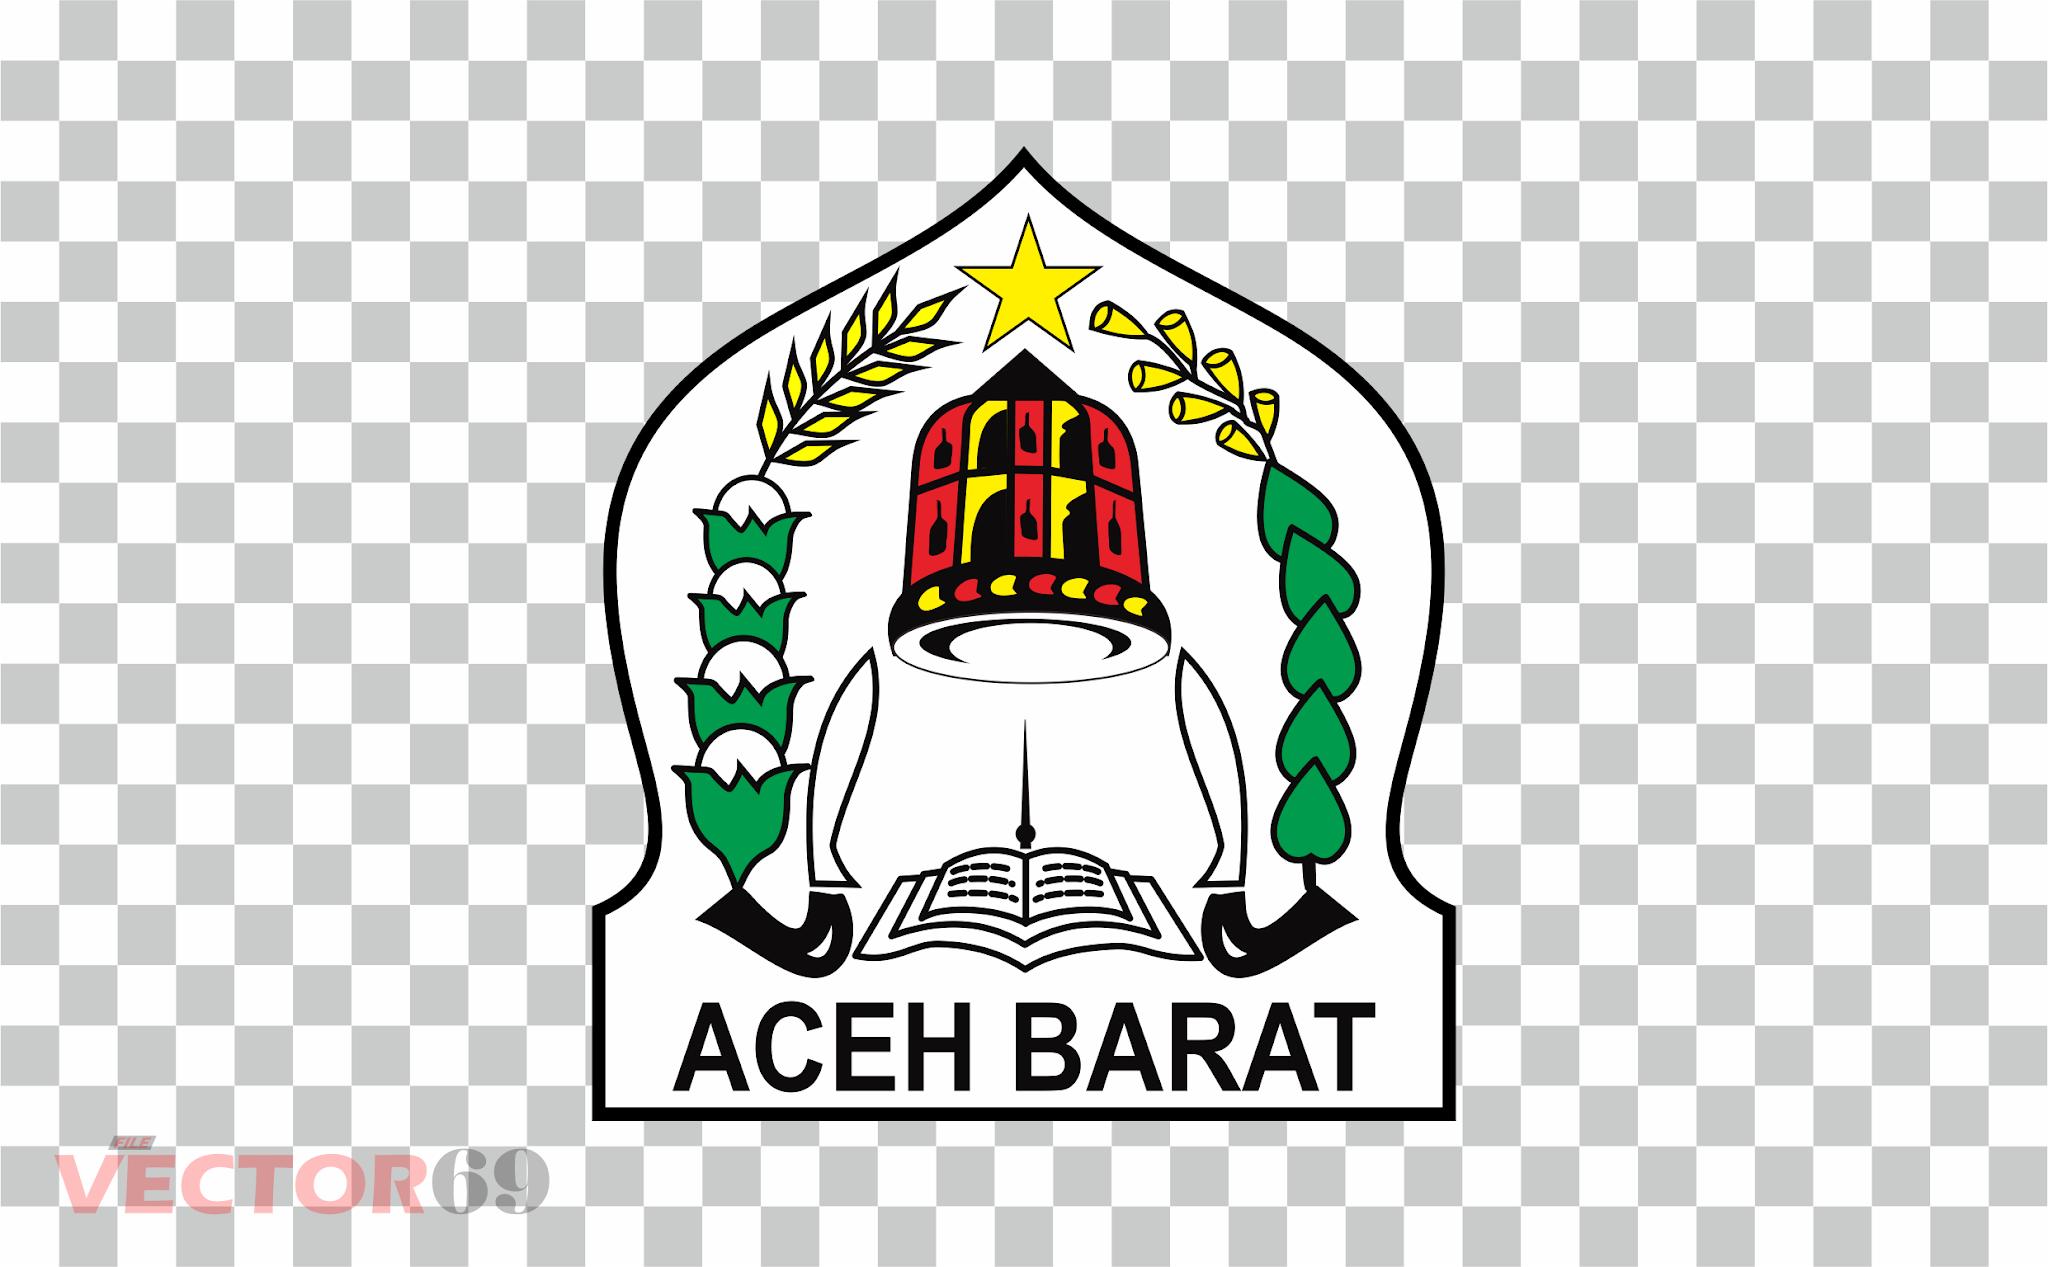 Kabupaten Aceh Barat Logo - Download Vector File PNG (Portable Network Graphics)